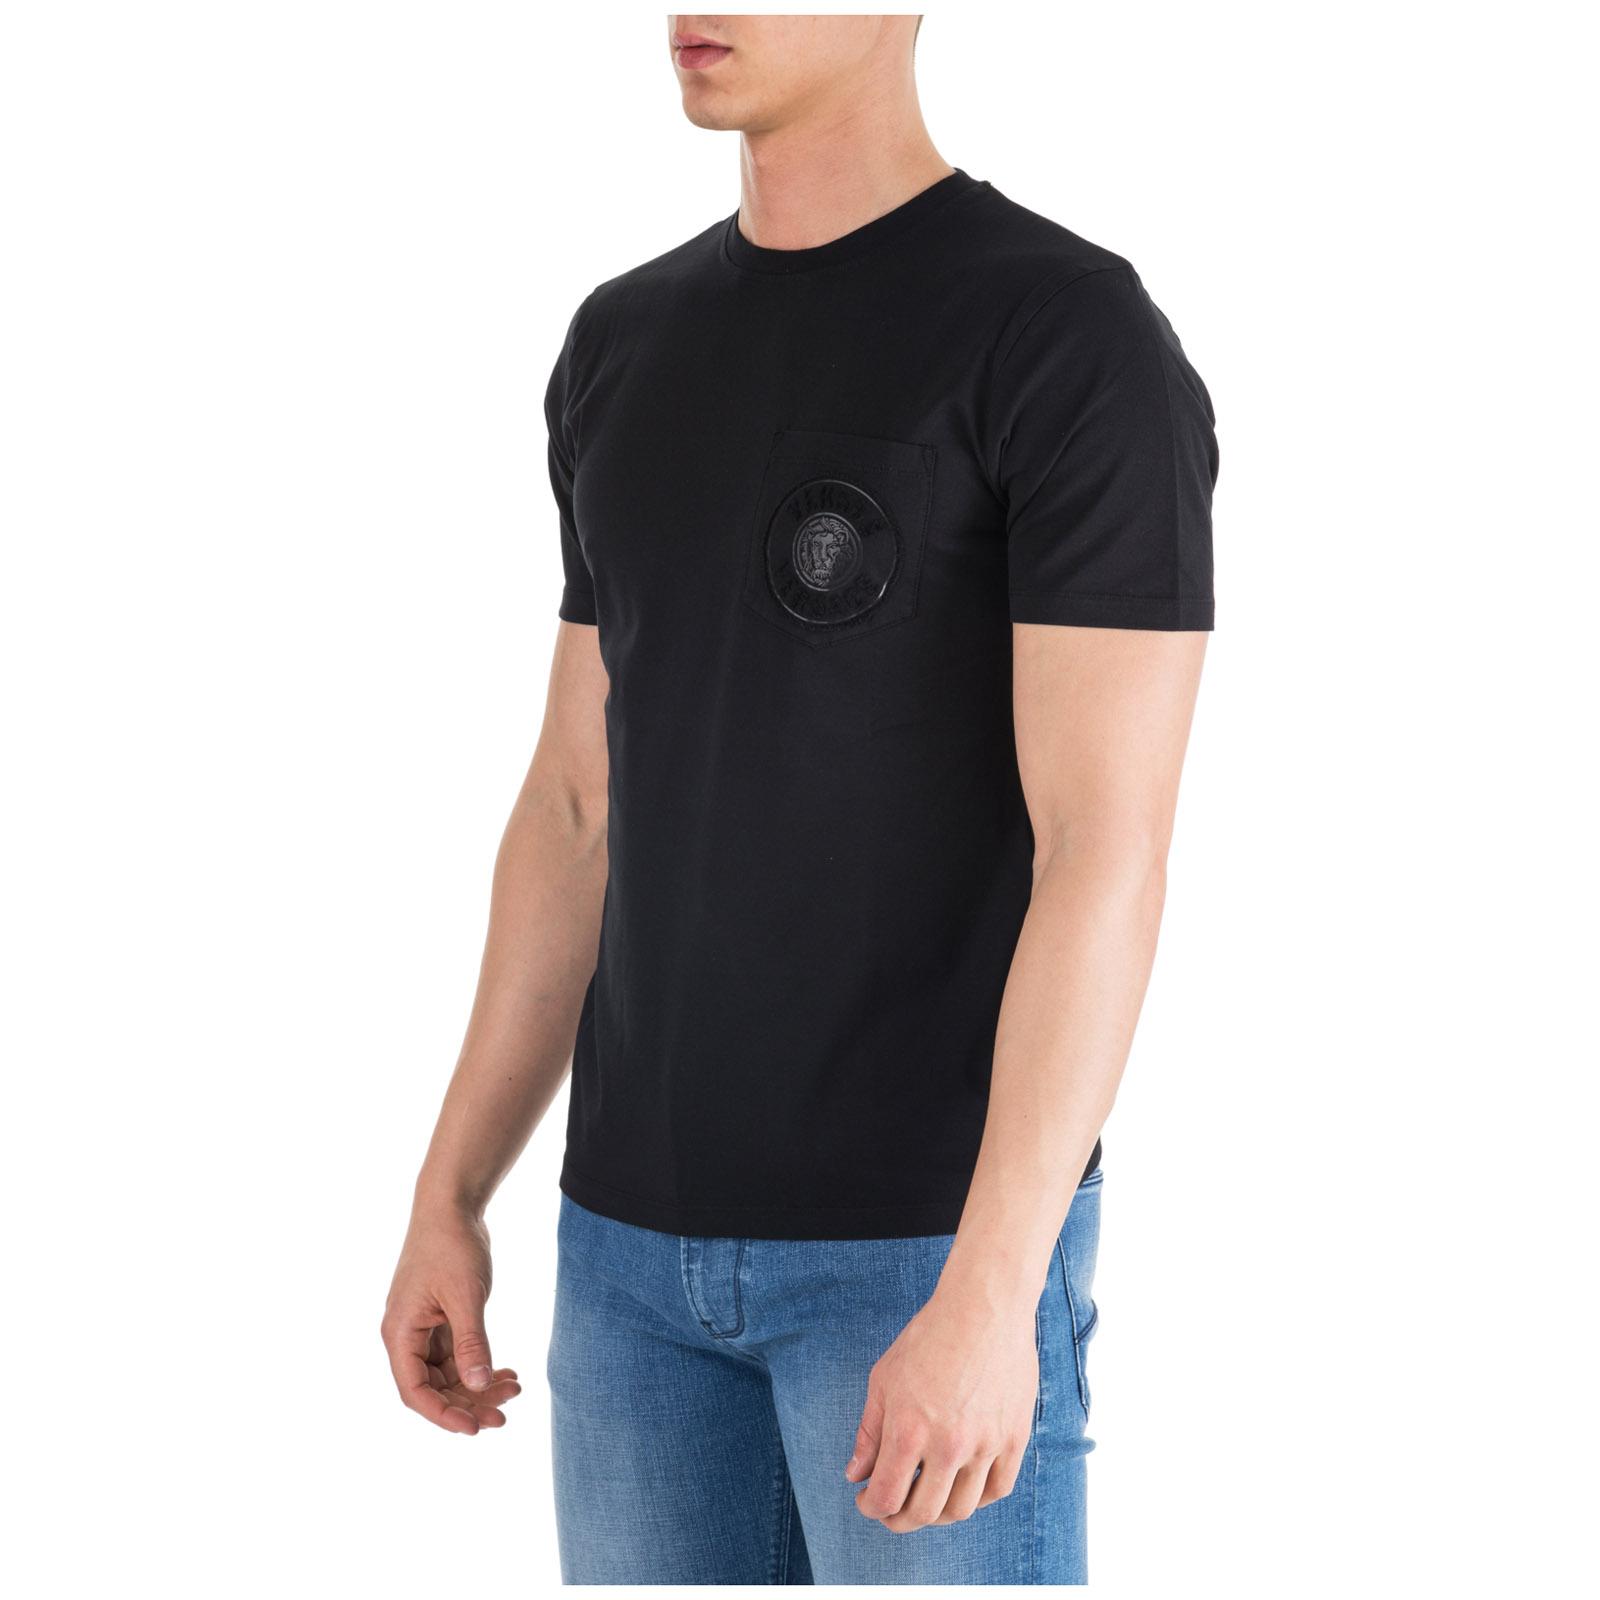 525aad6f T-shirt Versus Versace Lion Head BU90755-BJ10388_B1008 black ...